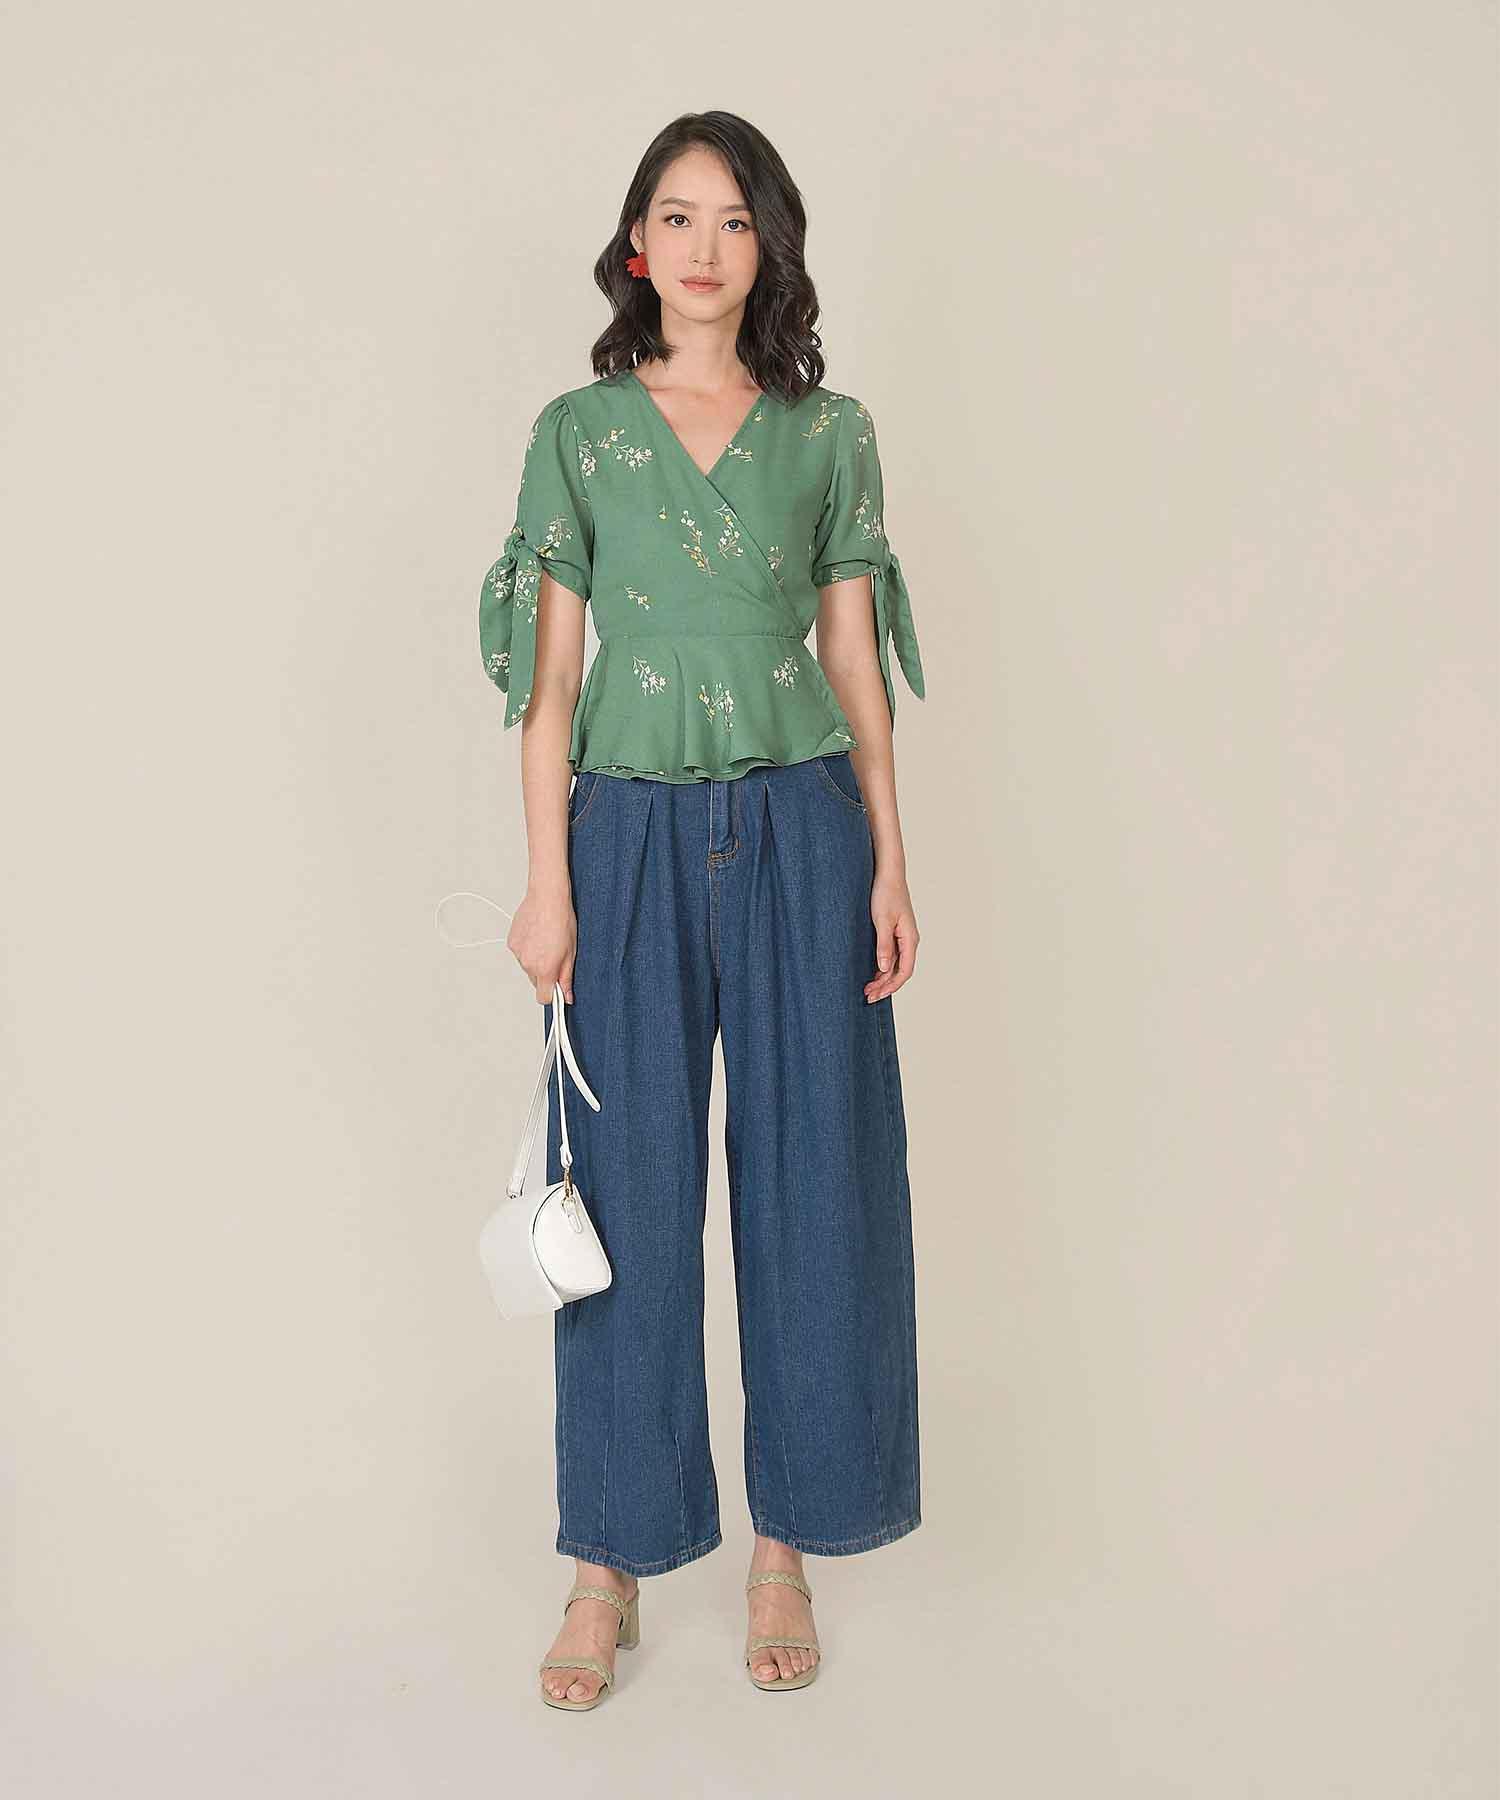 cider-oversized-jeans-dark-blue-wash-1